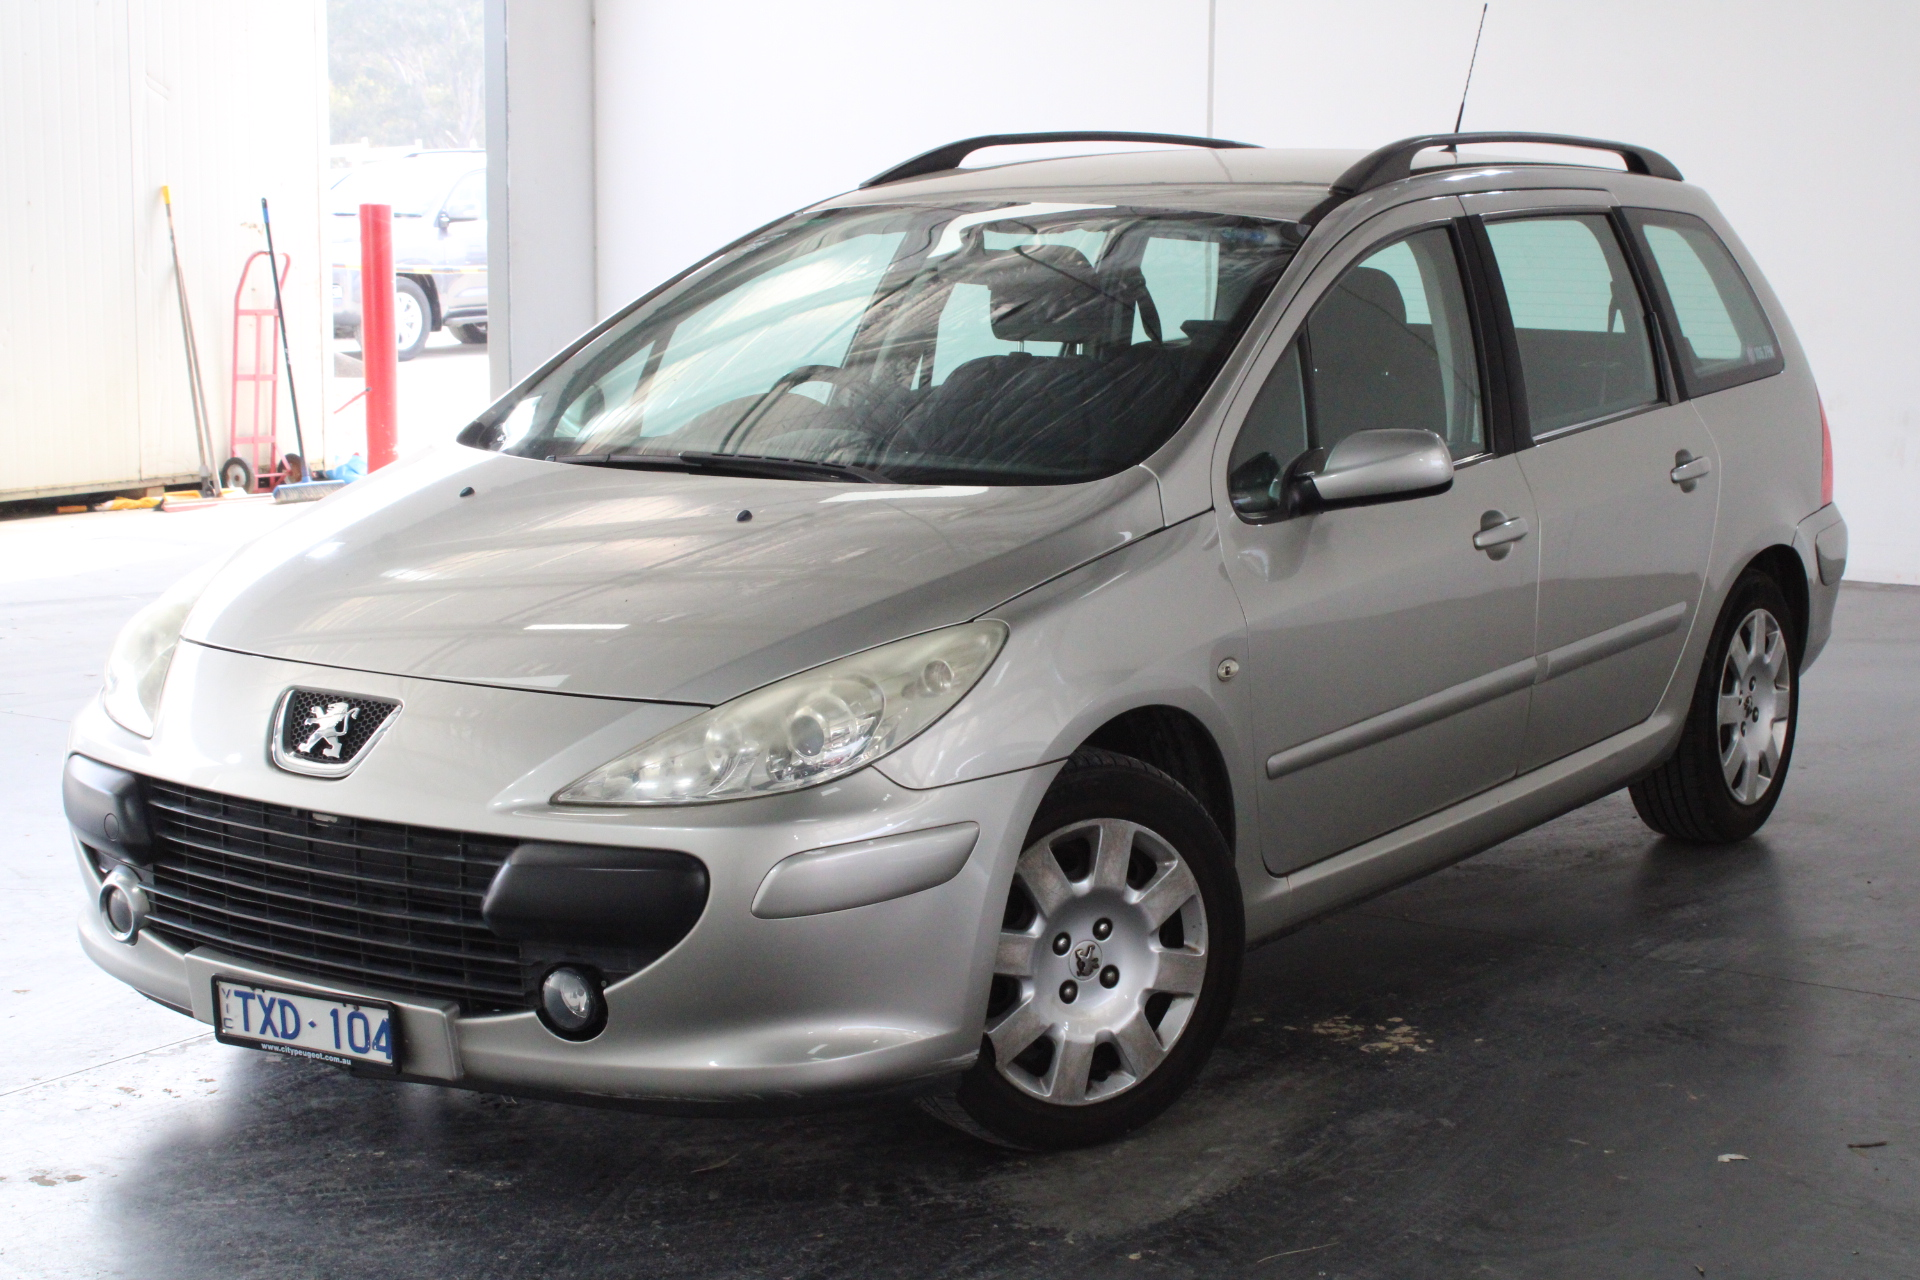 2006 Peugeot 307 XS HDi 1.6 Touring Turbo Diesel Manual Wagon